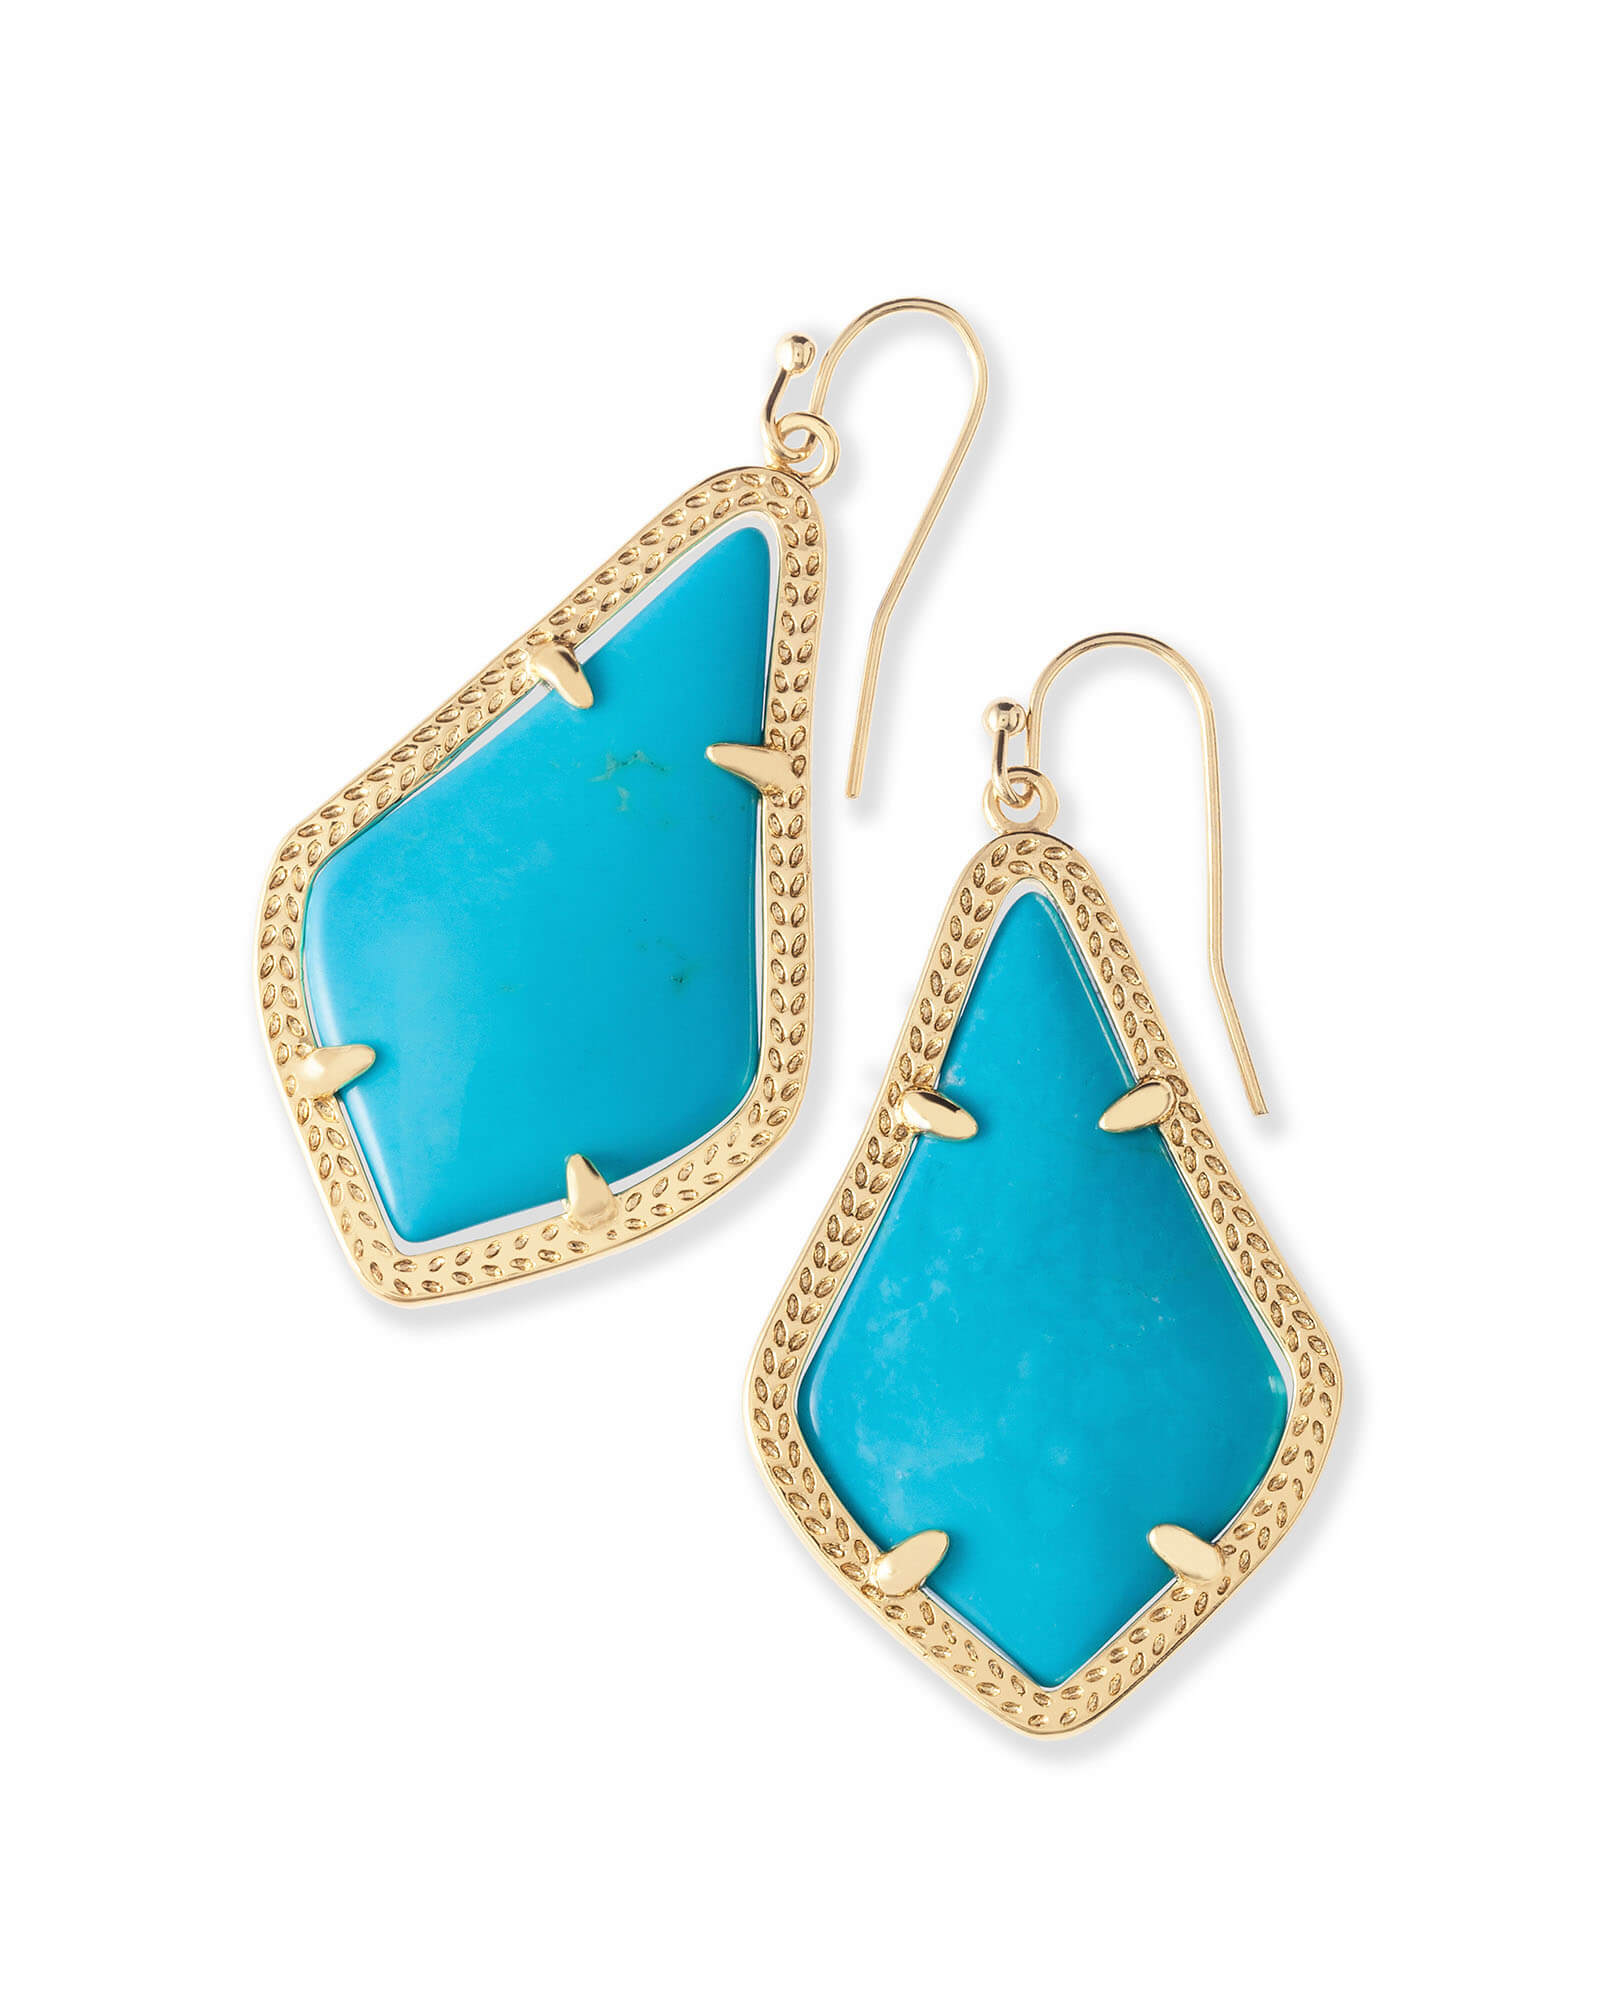 Alex Gold Drop Earrings In Turquoise